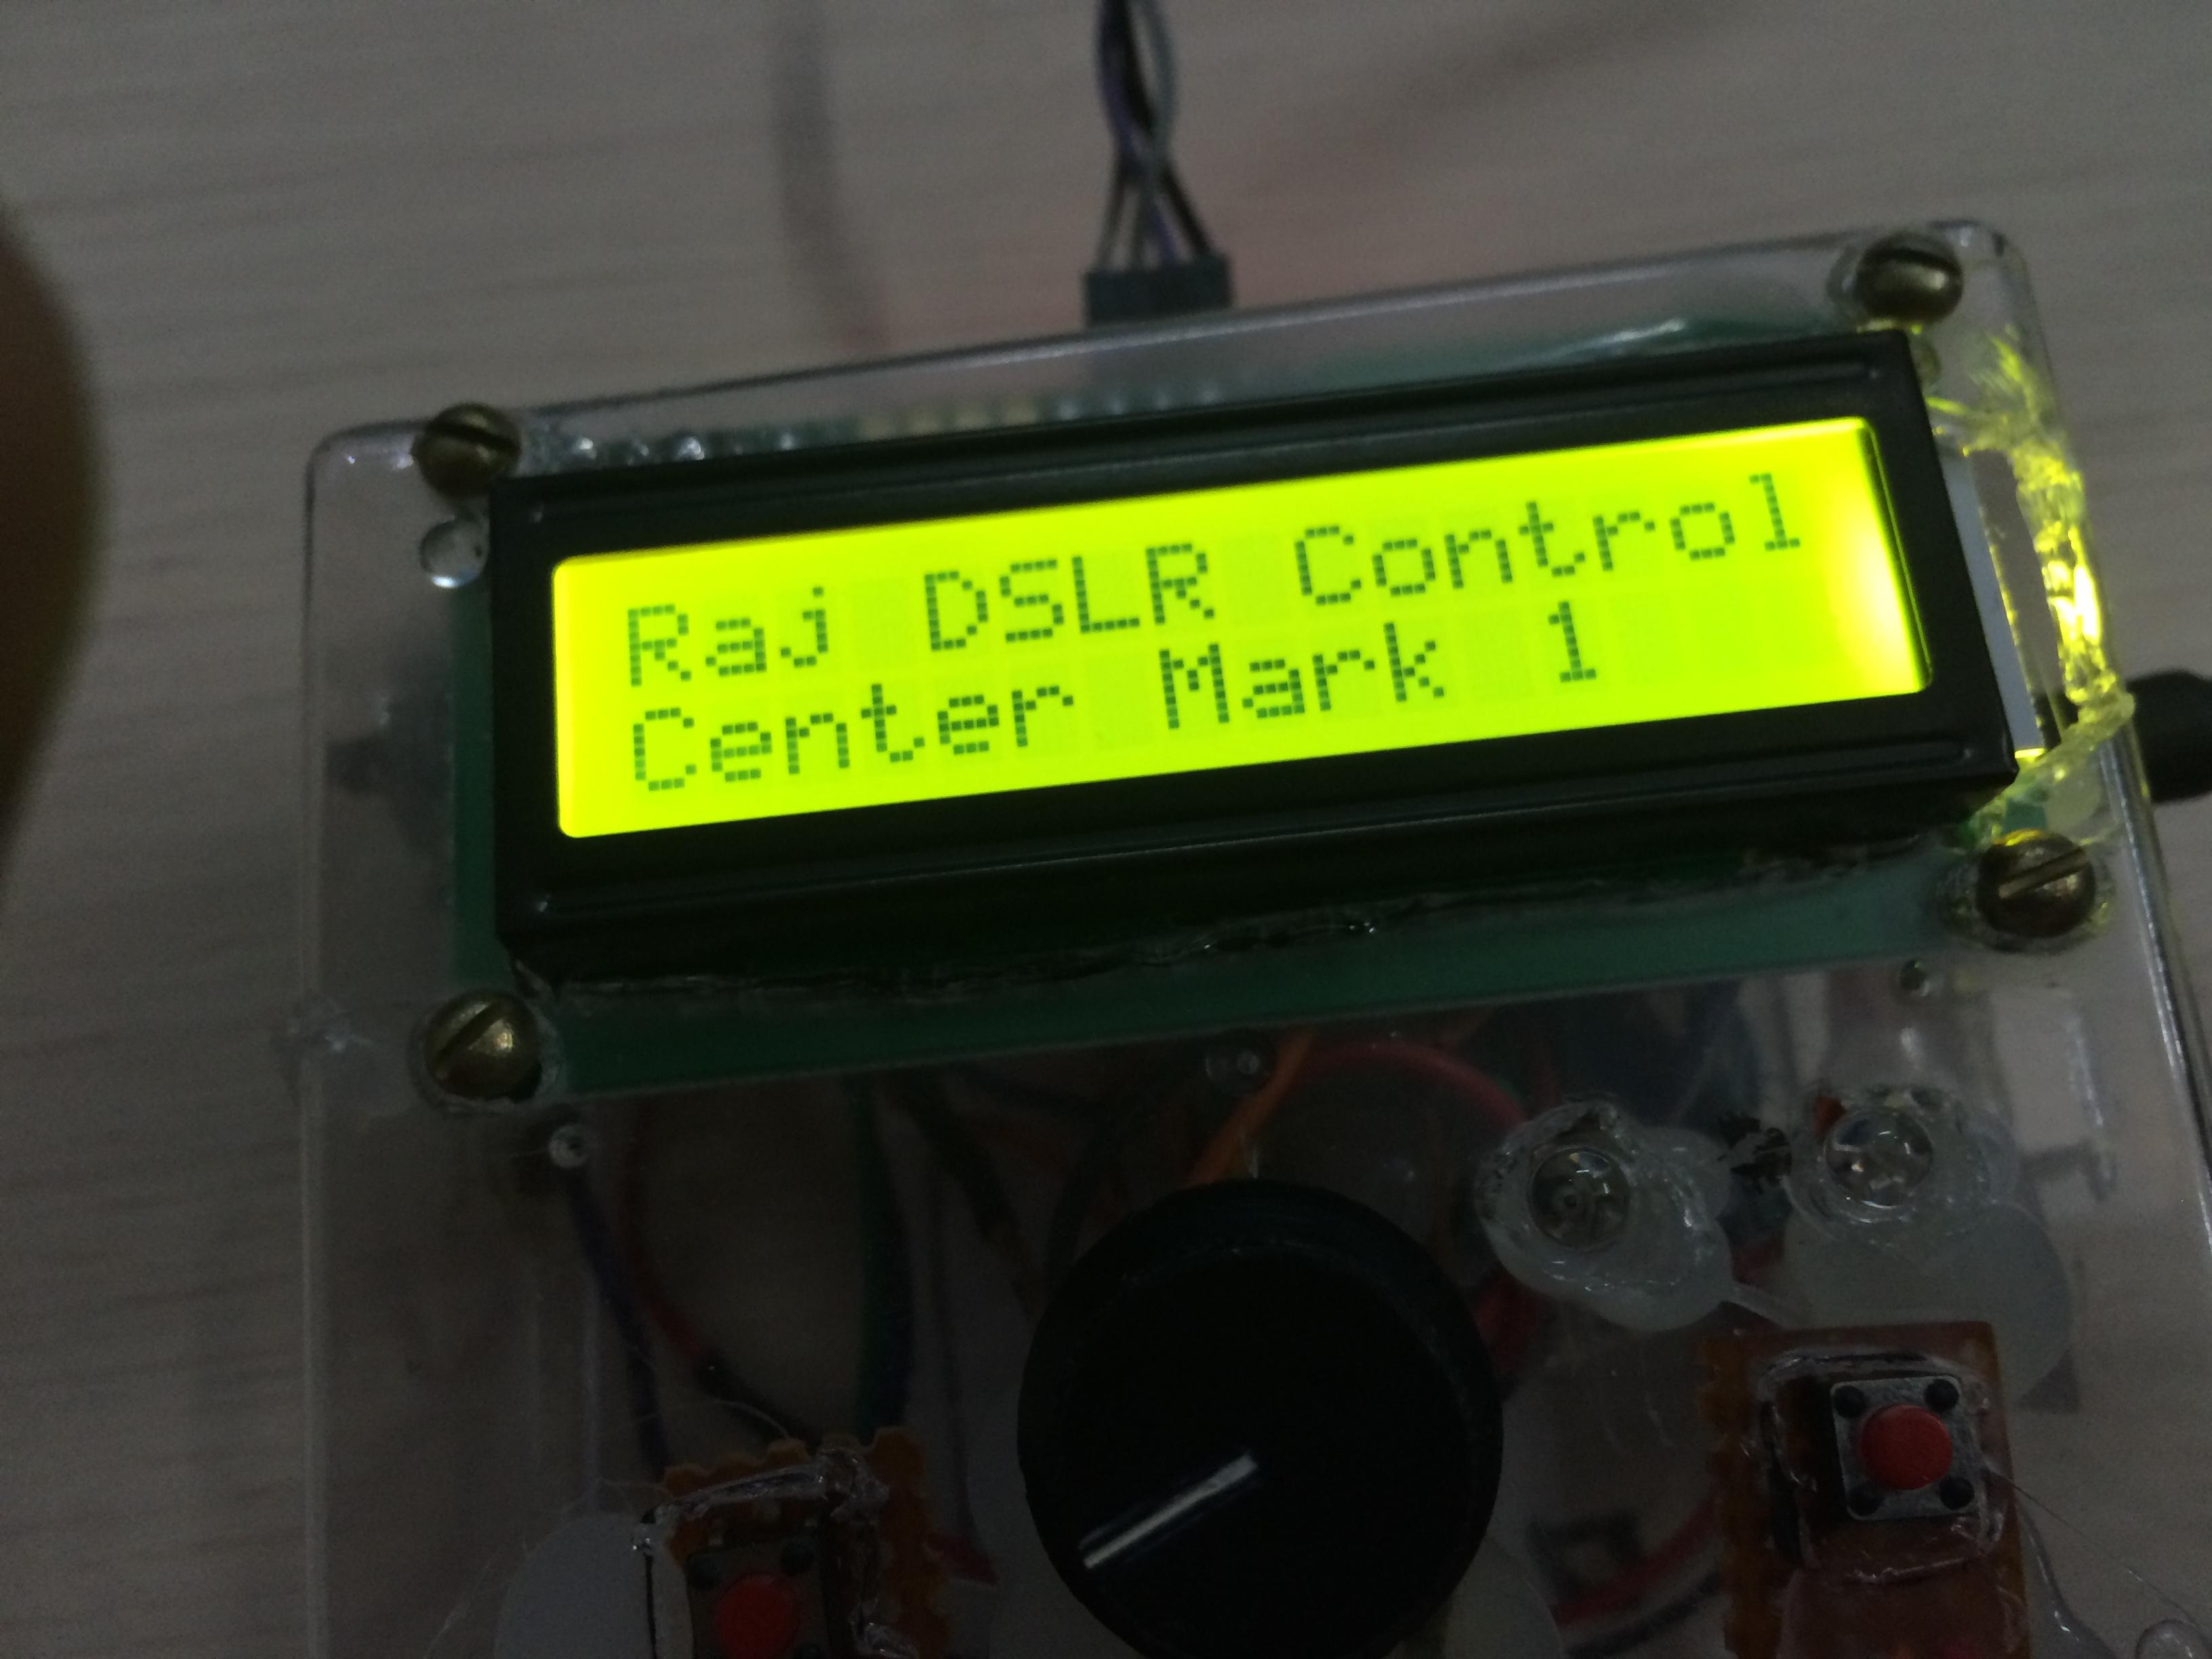 Picture of The Unique DSLR Intervalometer!